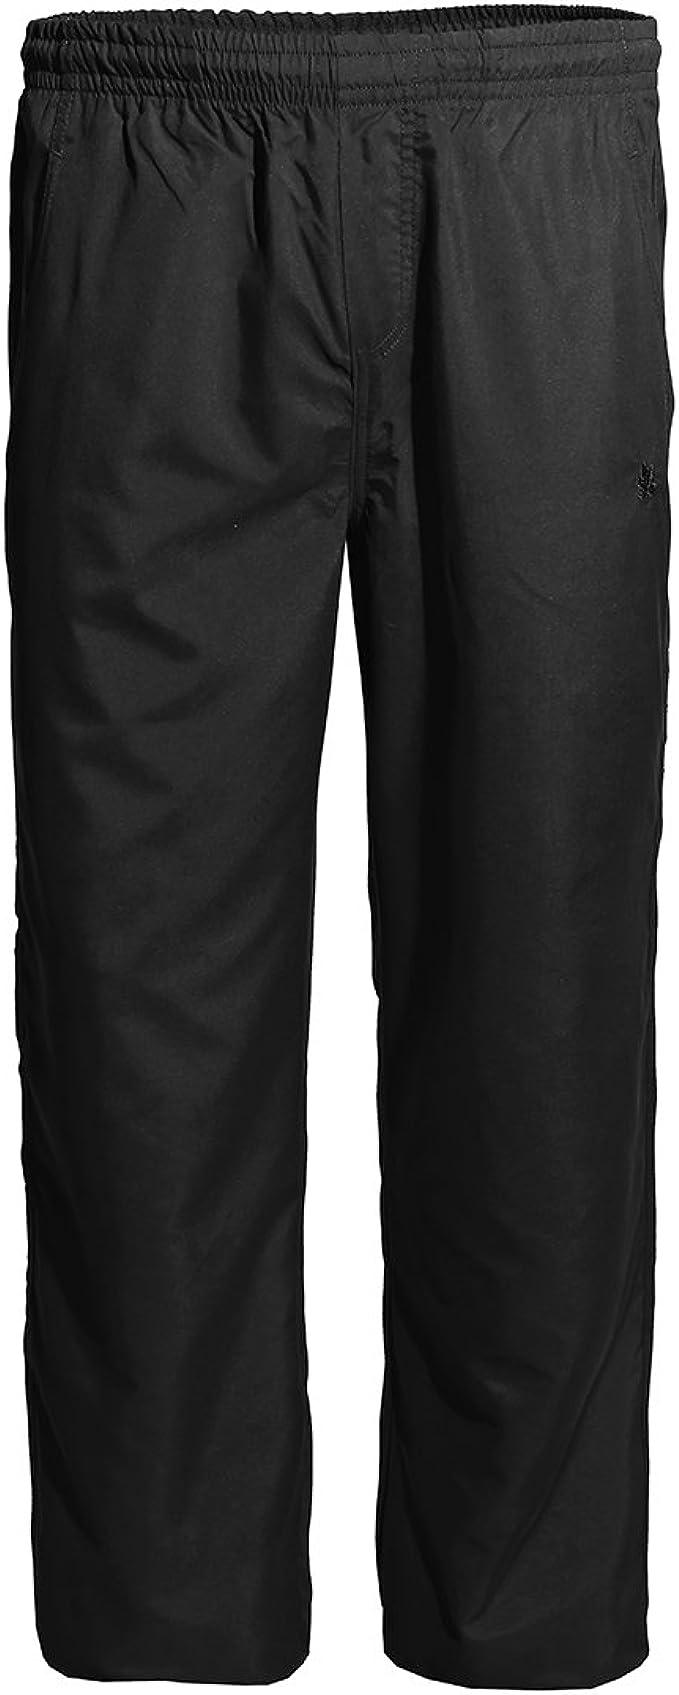 Pantalón de chándal de Microfibra XXL Negro Extra Largo Ahorn ...